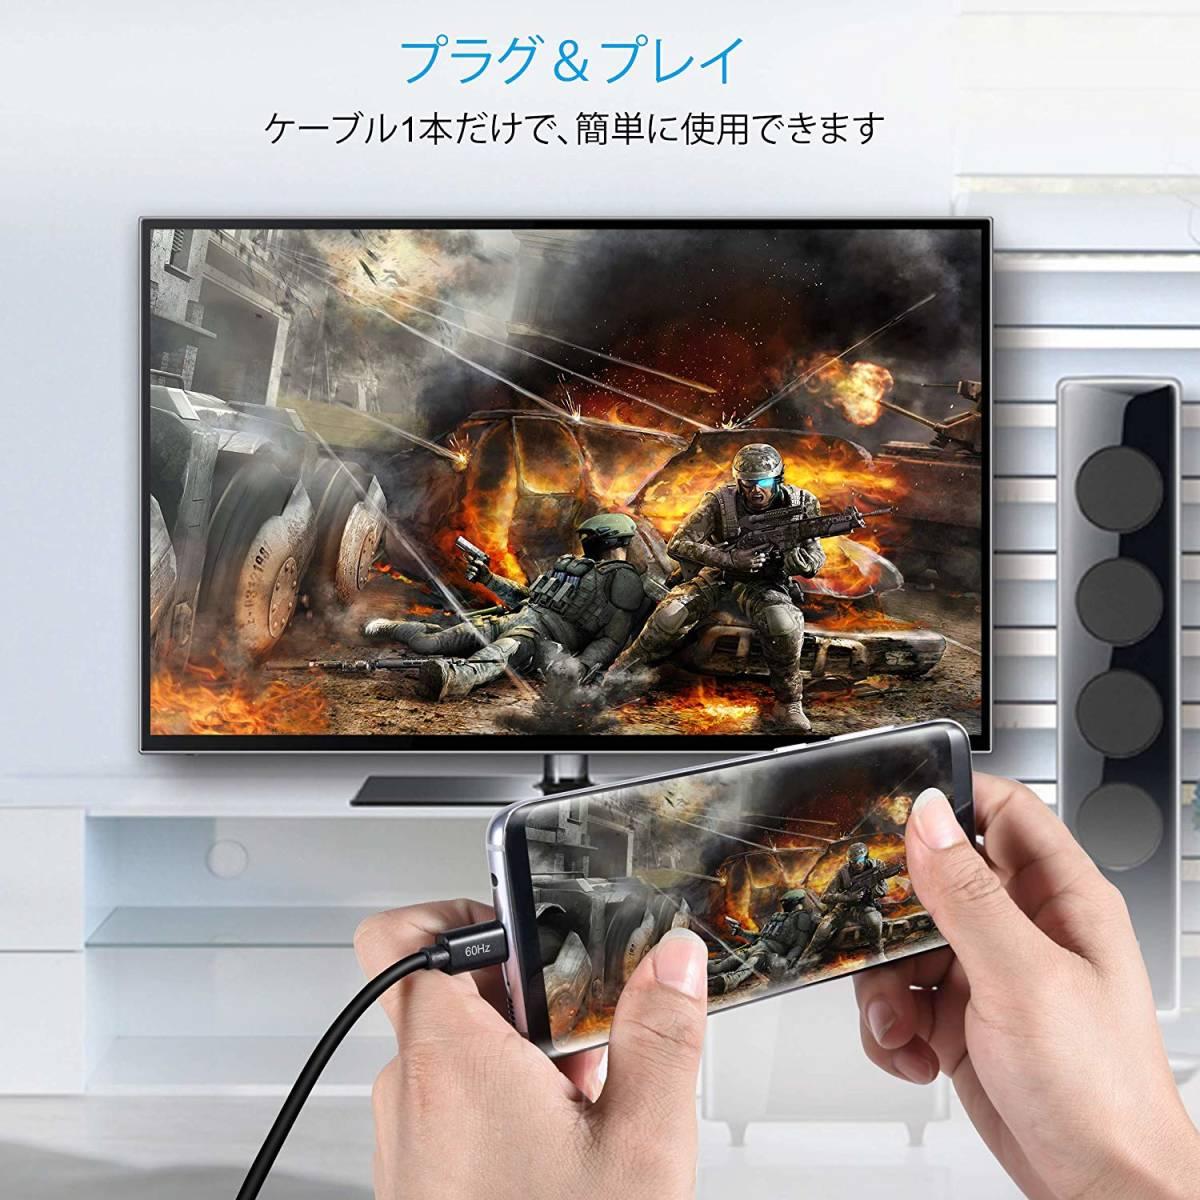 新品●USB C to HDMI、CHOETECH 4K @ 60Hz 1.8m / 6ft USB C to HDMIケーブルThunderbolt 3対応CタイプHDMIケーブル V3666_画像7